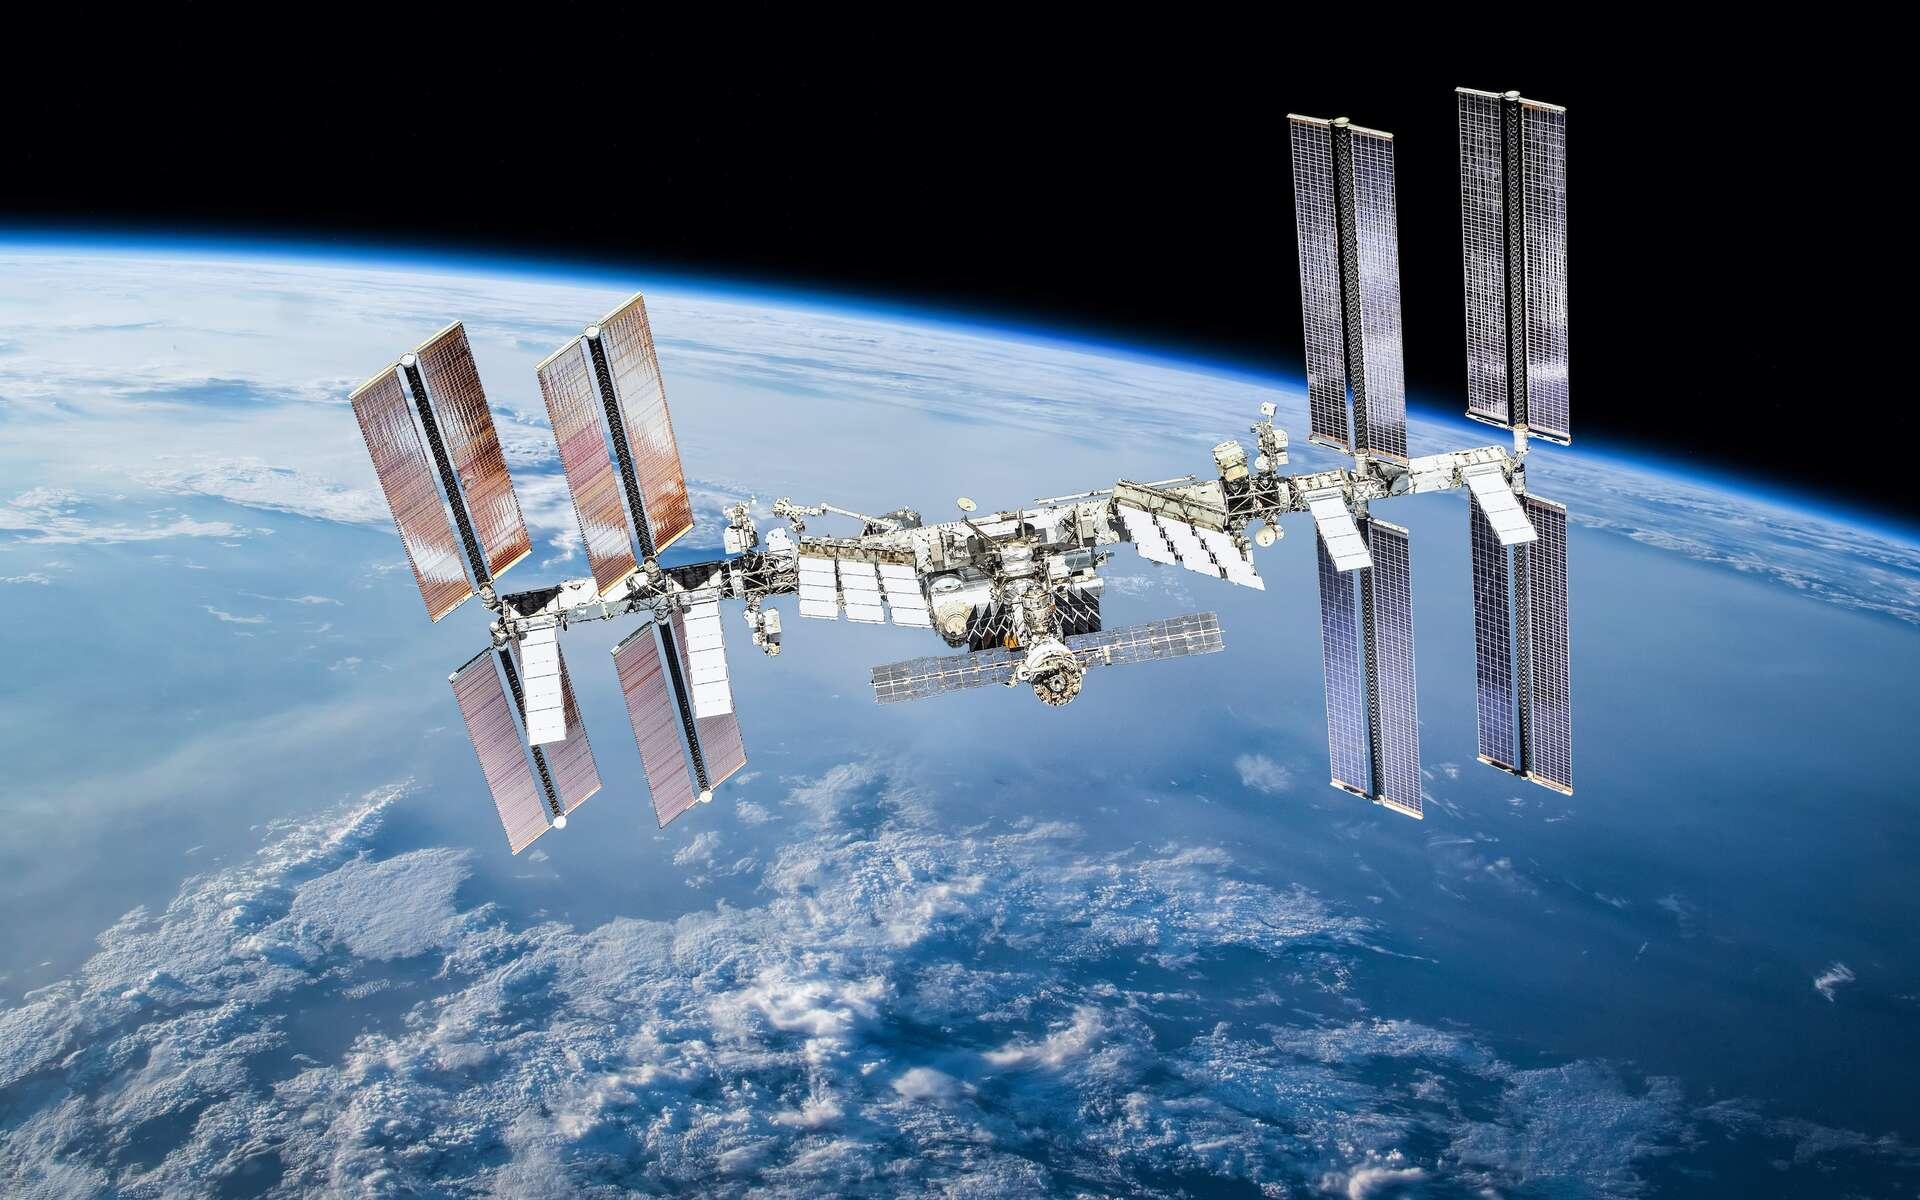 Illustration de la Station spatiale internationale. © dimazel, Adobe Stock